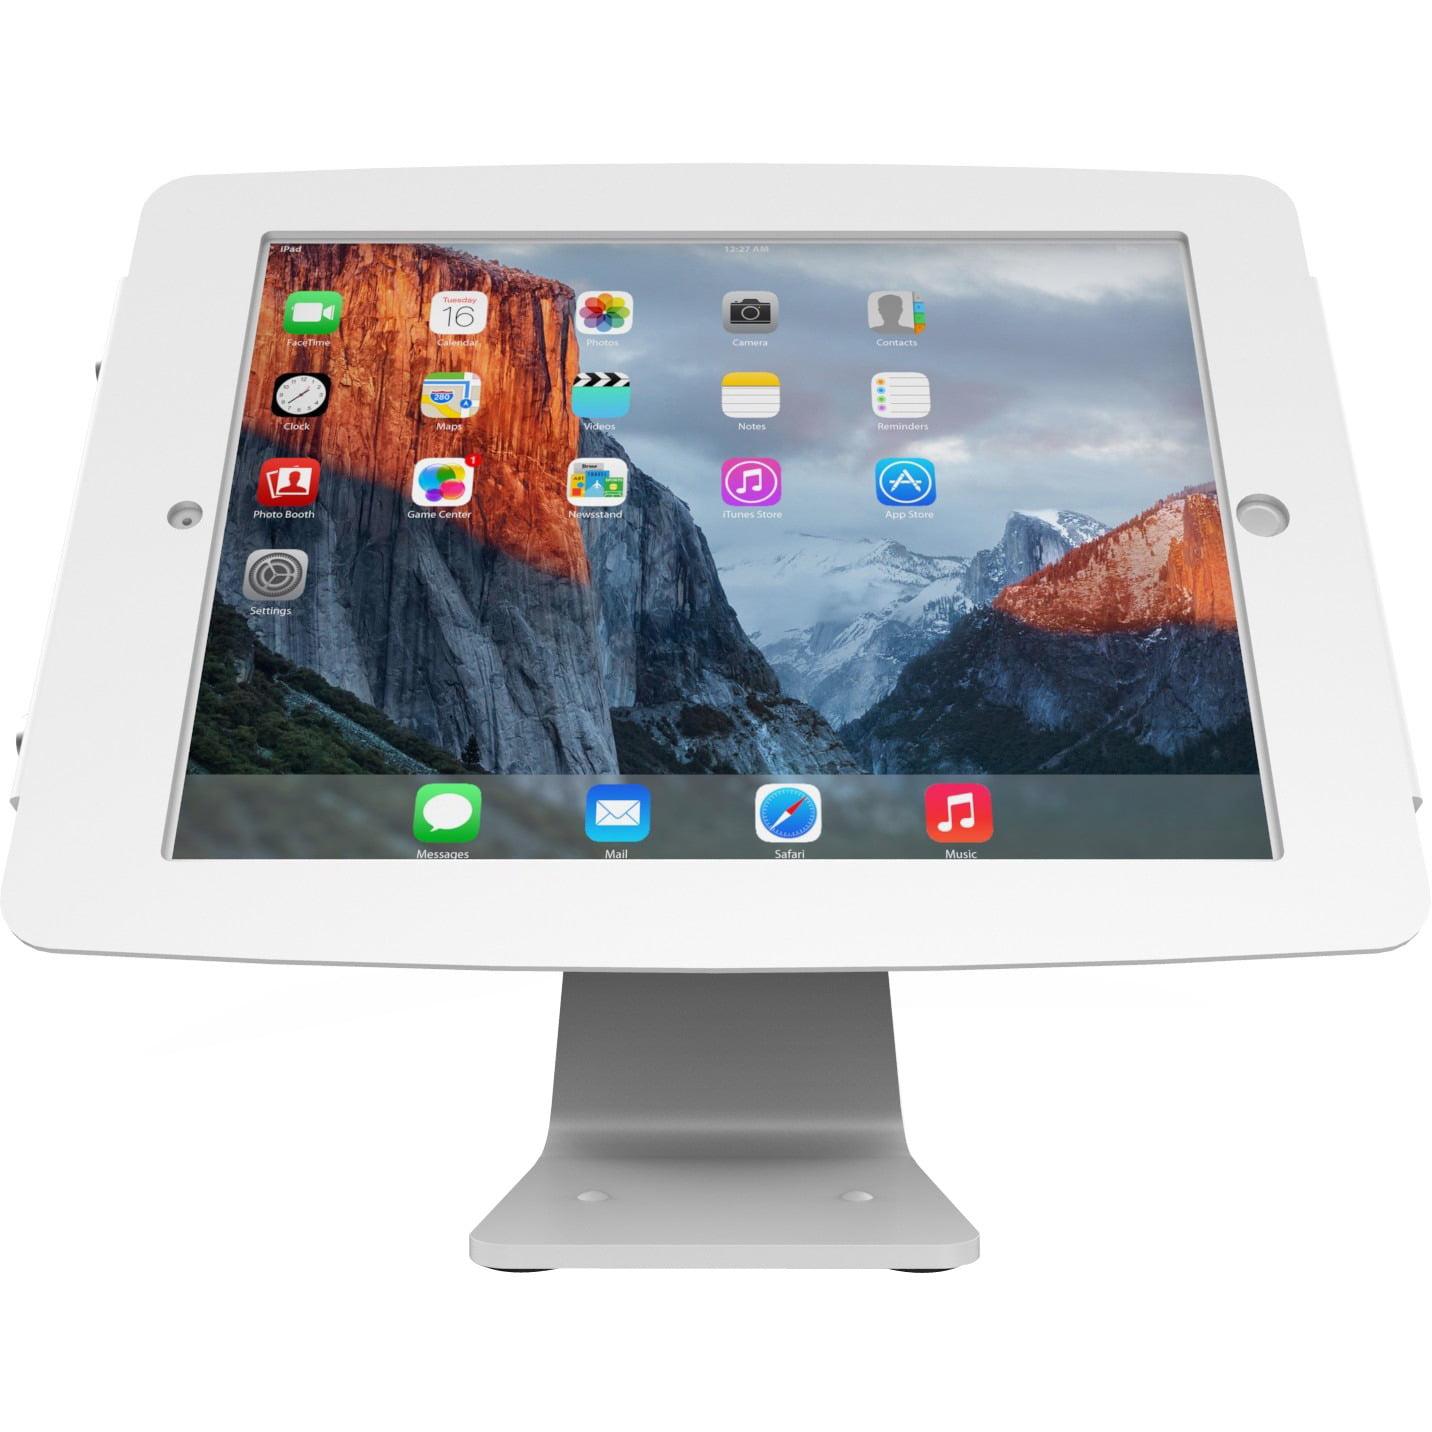 Maclocks Space iPad 360 Rotating and Tilting Enclosure for iPad Pro 360 (White)